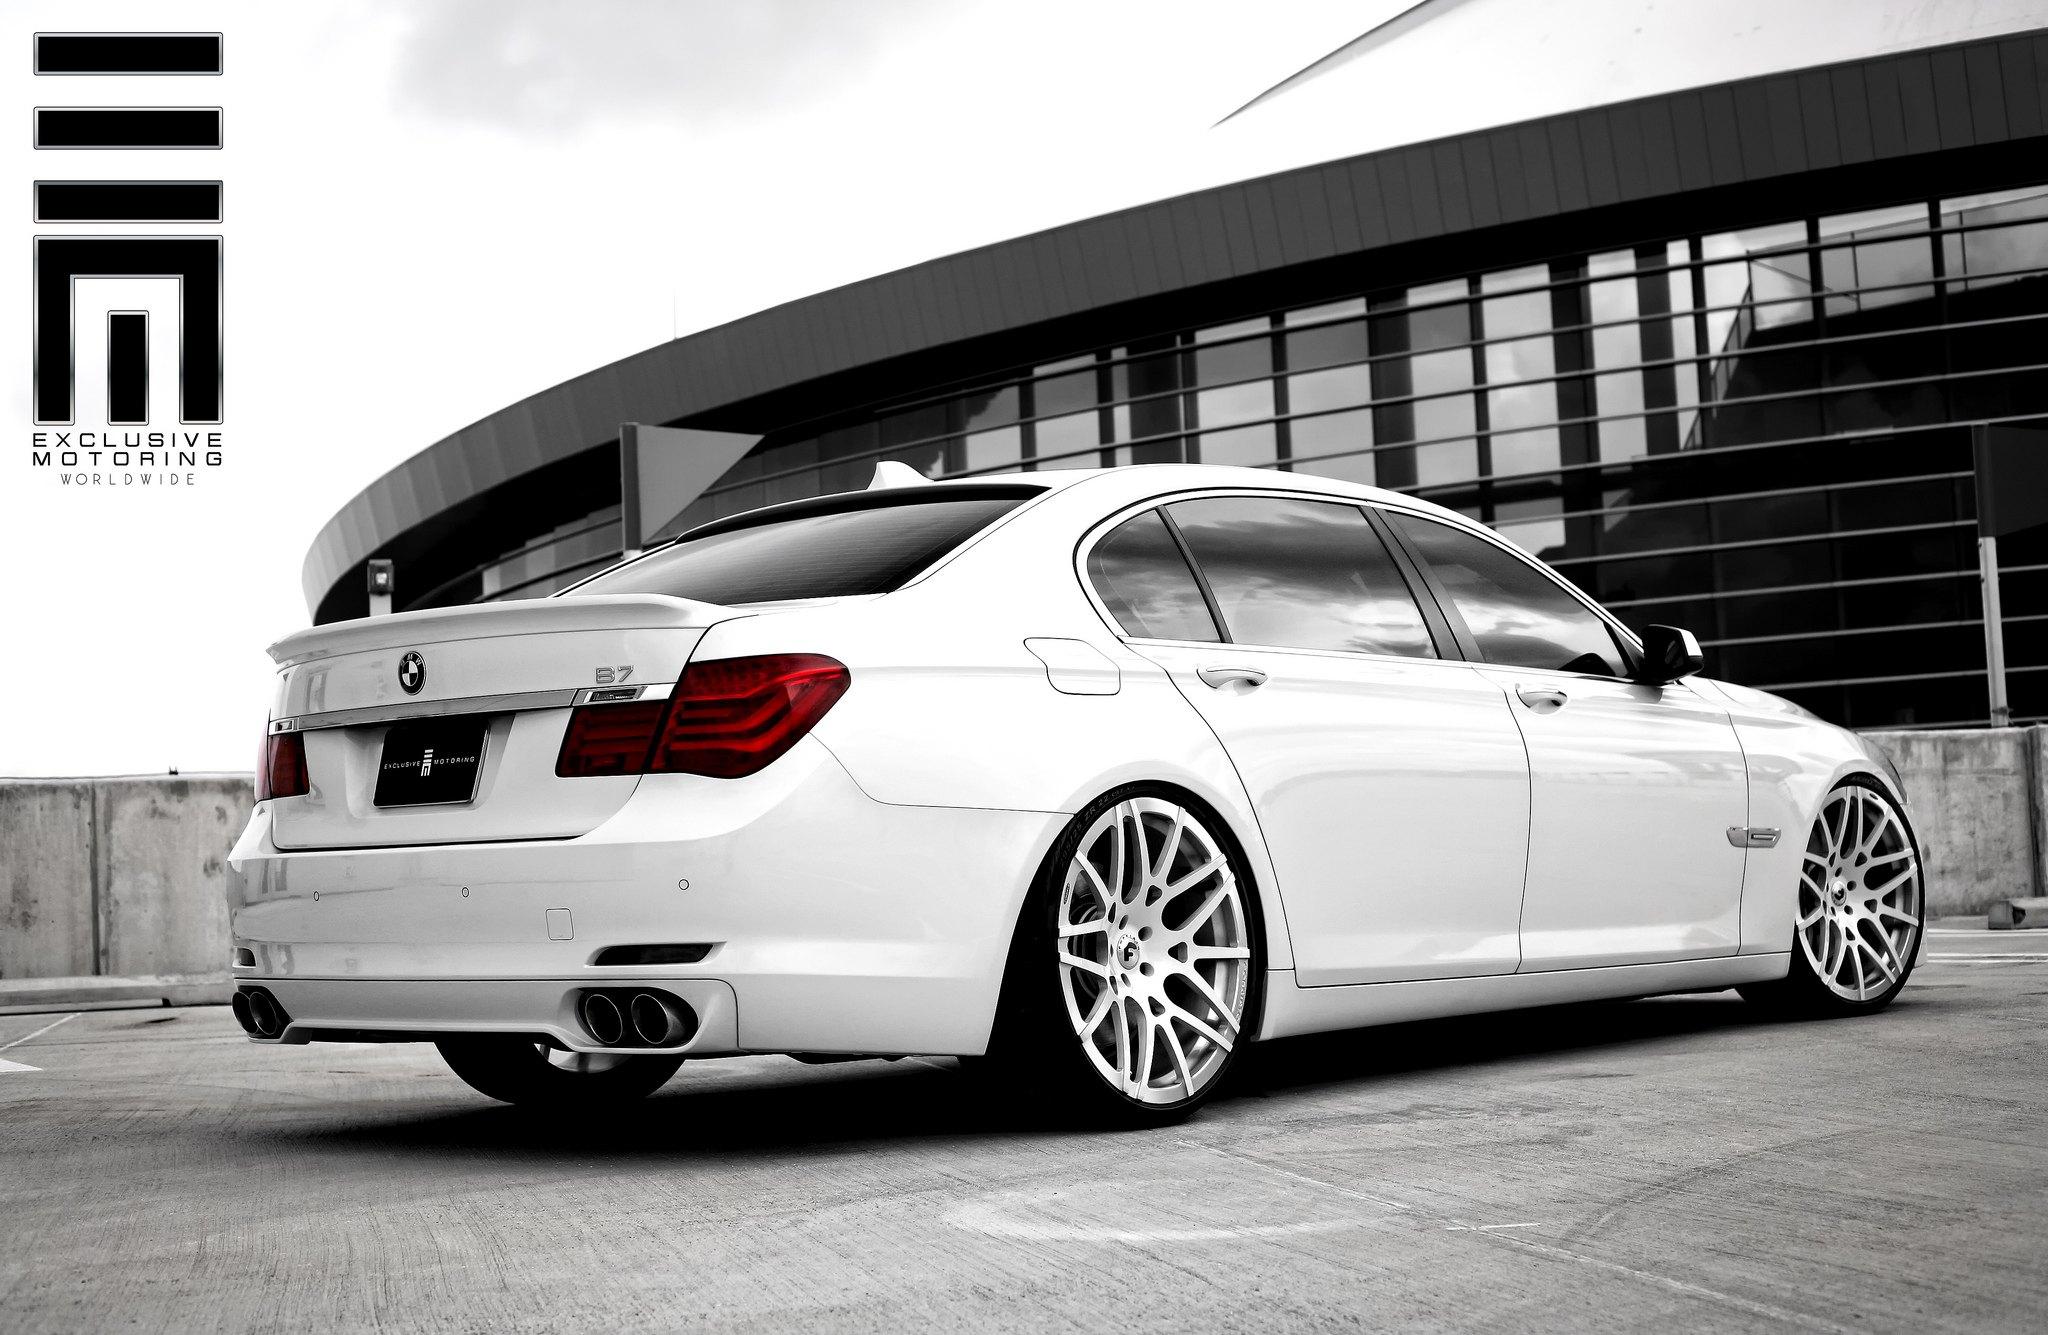 Mineral White BMW Alpina B7 On Custom Rims